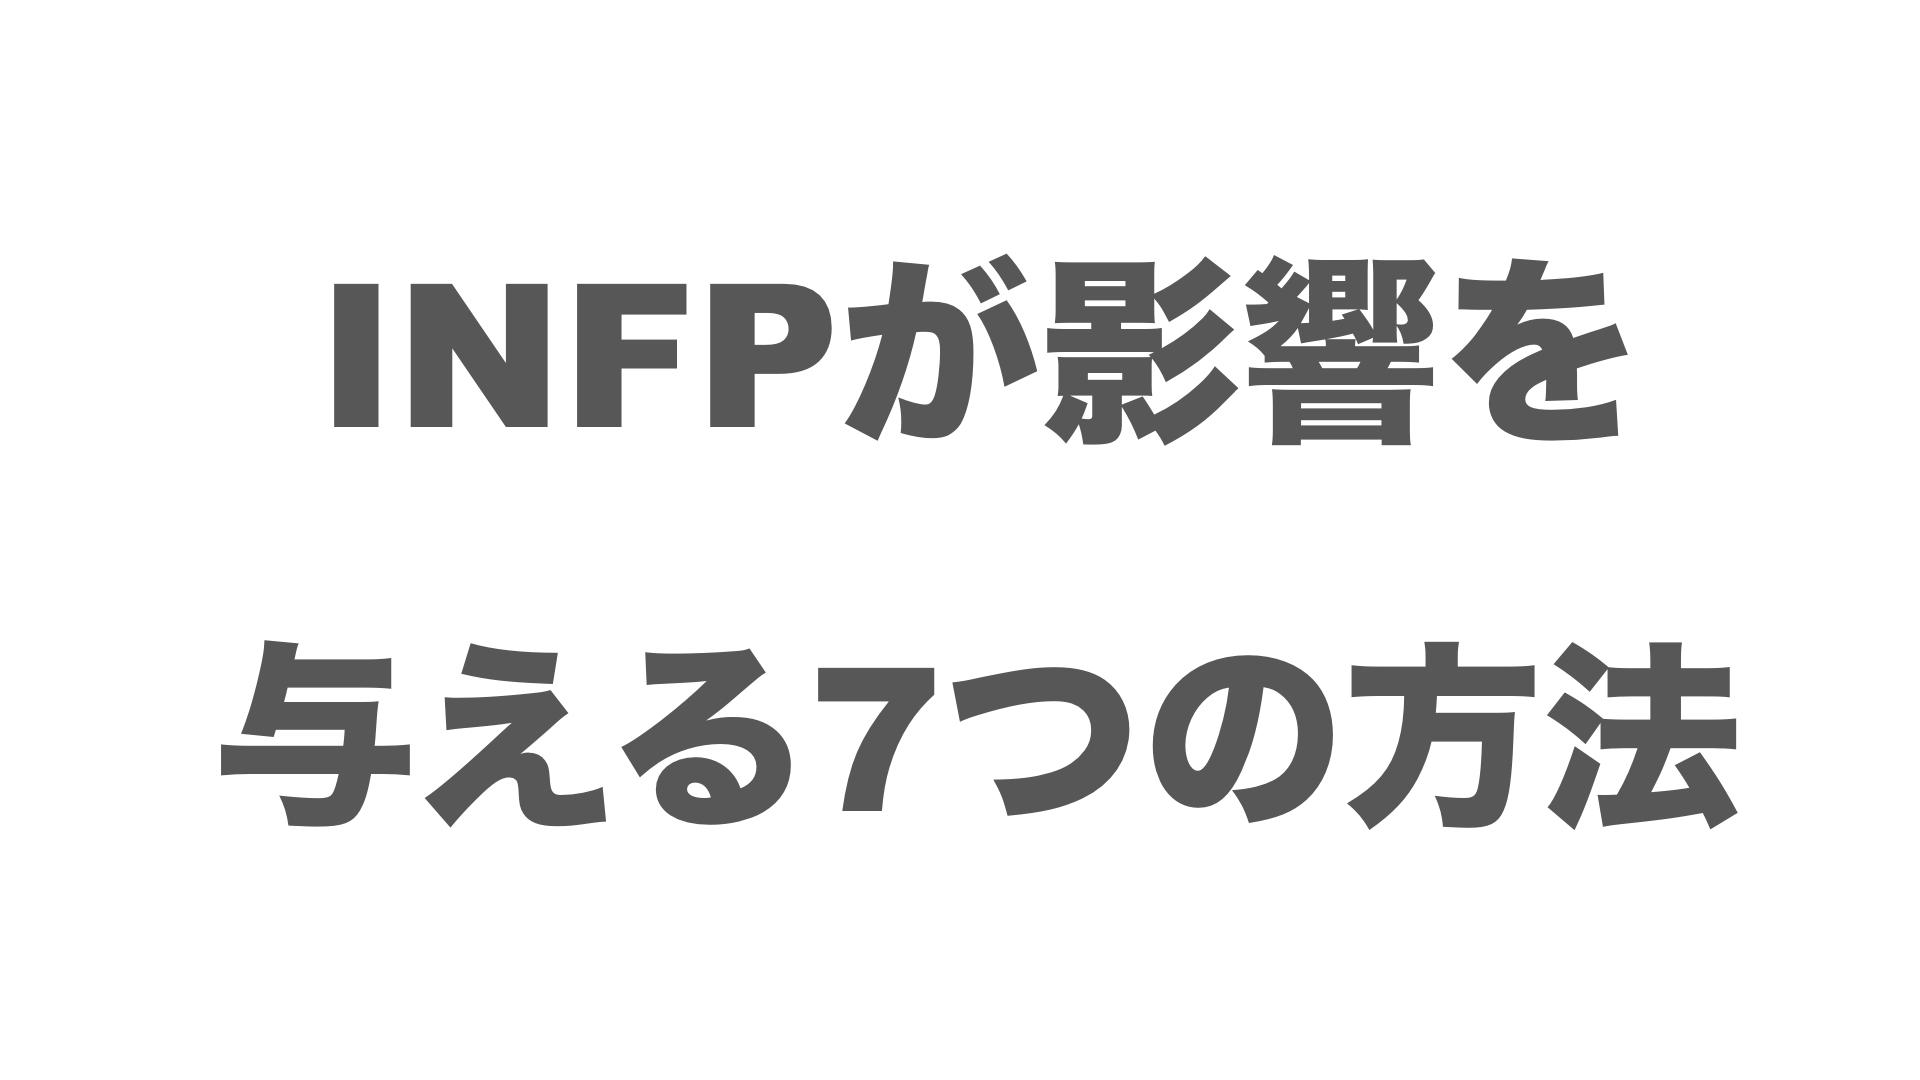 【MBTI】INFPが影響力を与えるための7つの方法